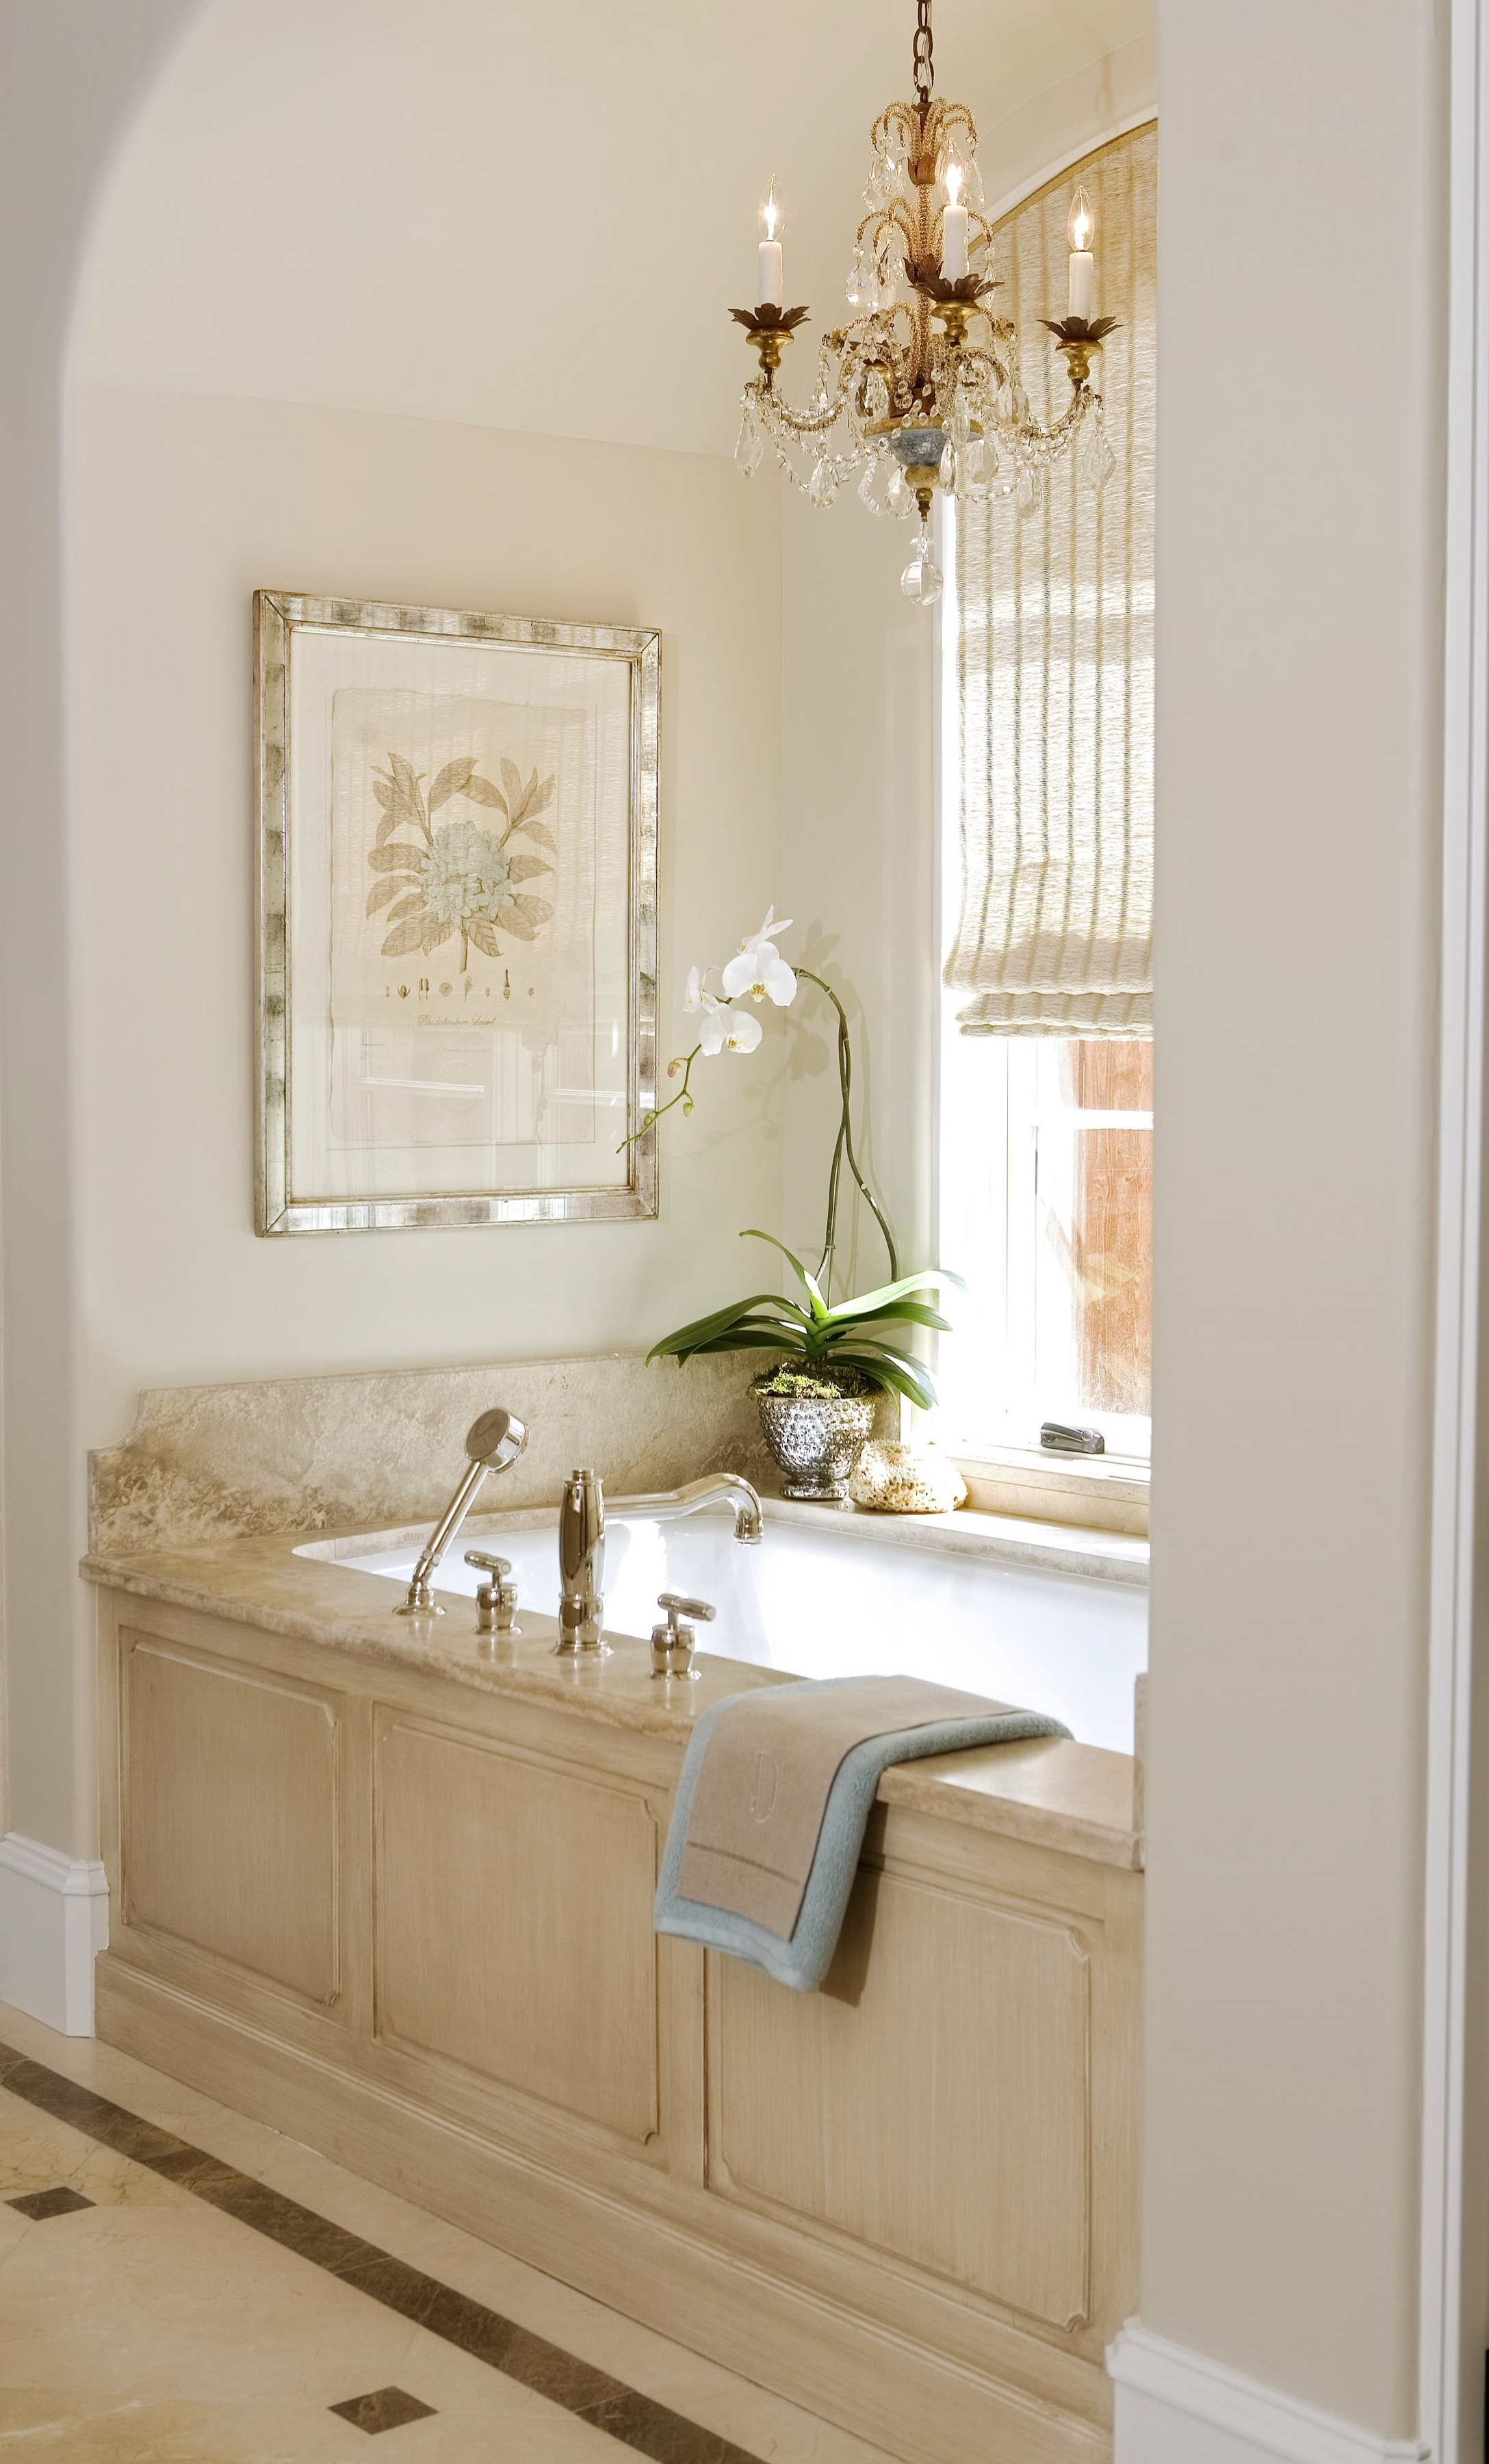 24.Master bathroom.jpg